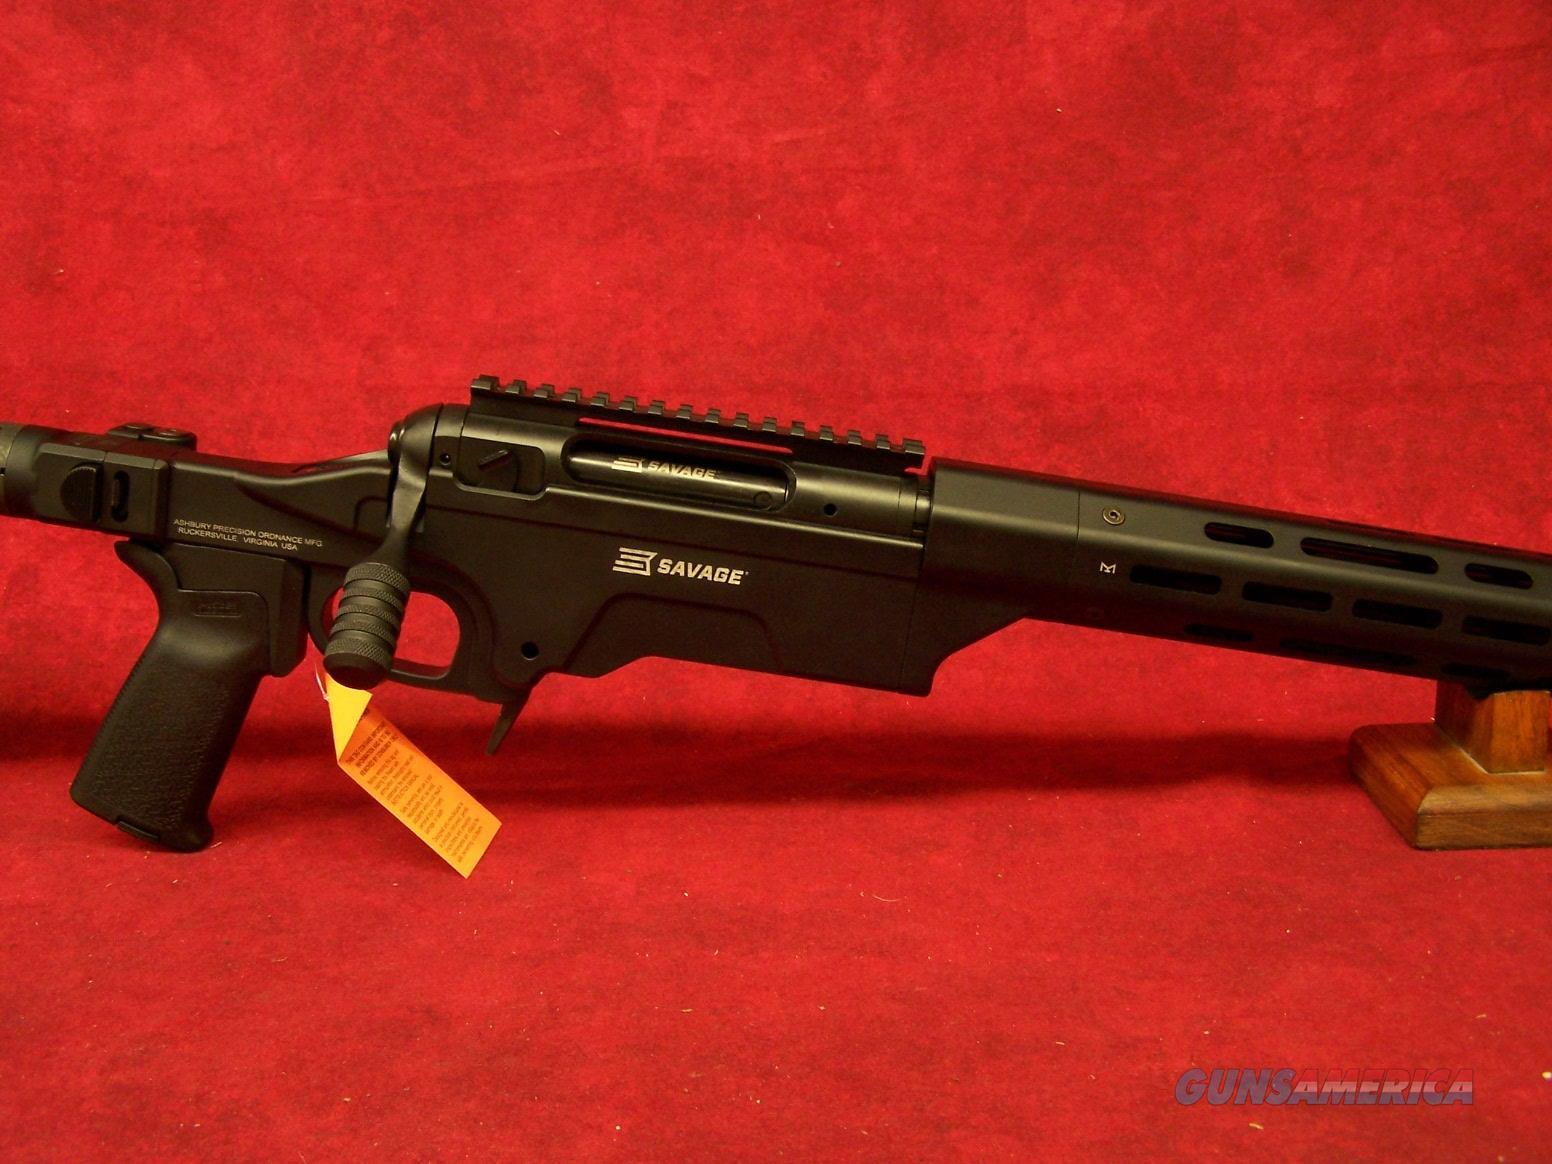 "SAVAGE 10 ASHBURY PRECISION 6.5 CREEDMOOR 24"" THREADED MUZZLE FOLDING STOCK  (22632)  Guns > Rifles > Savage Rifles > 10/110"